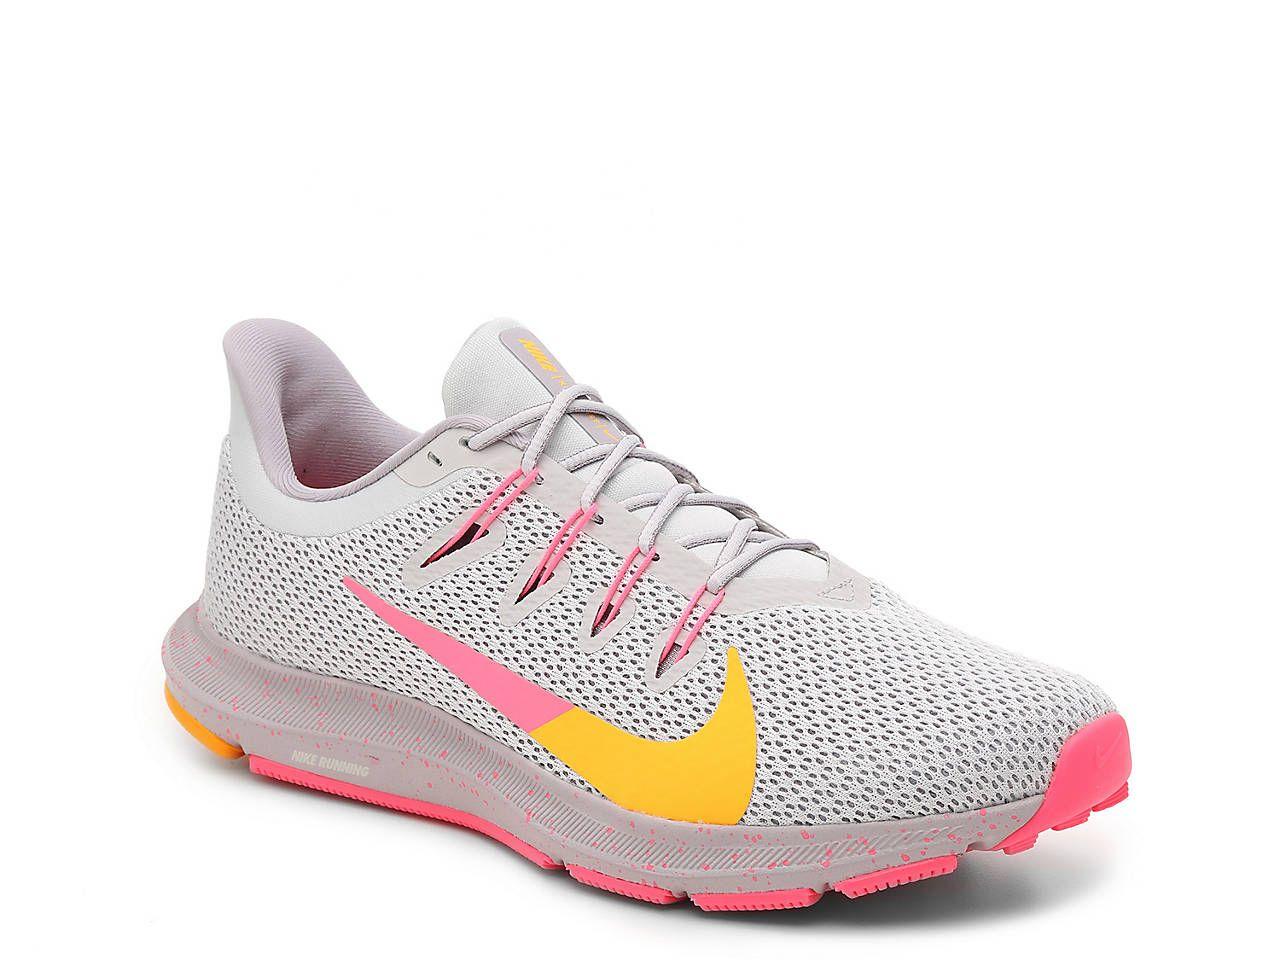 Nike Quest 2 Running Shoe - Women's in